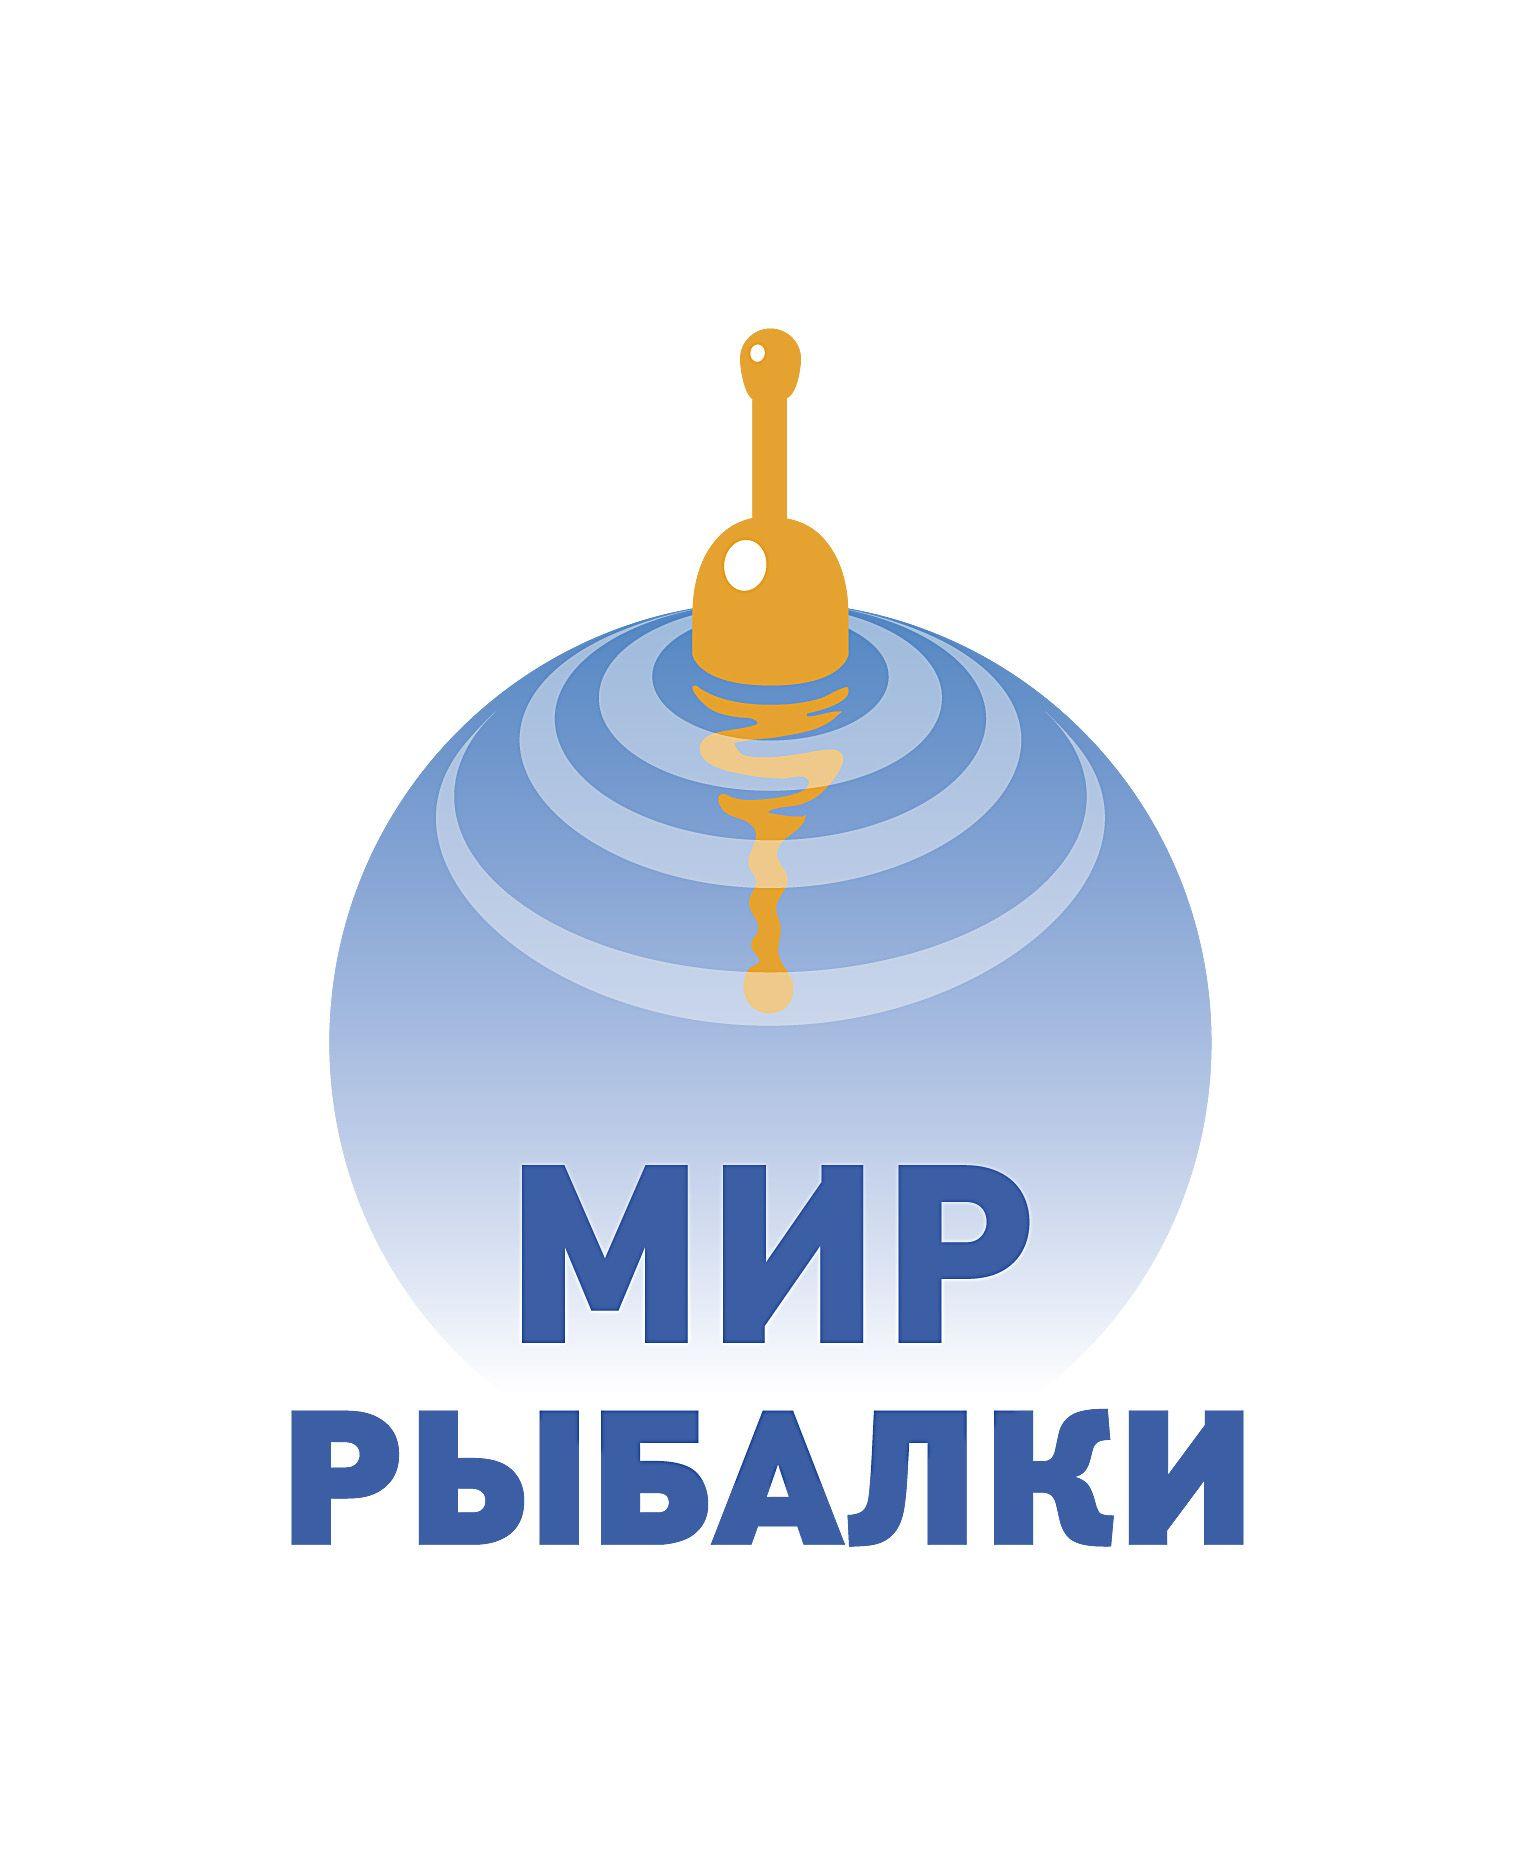 Логотип рыболовного магазина - дизайнер andblin61